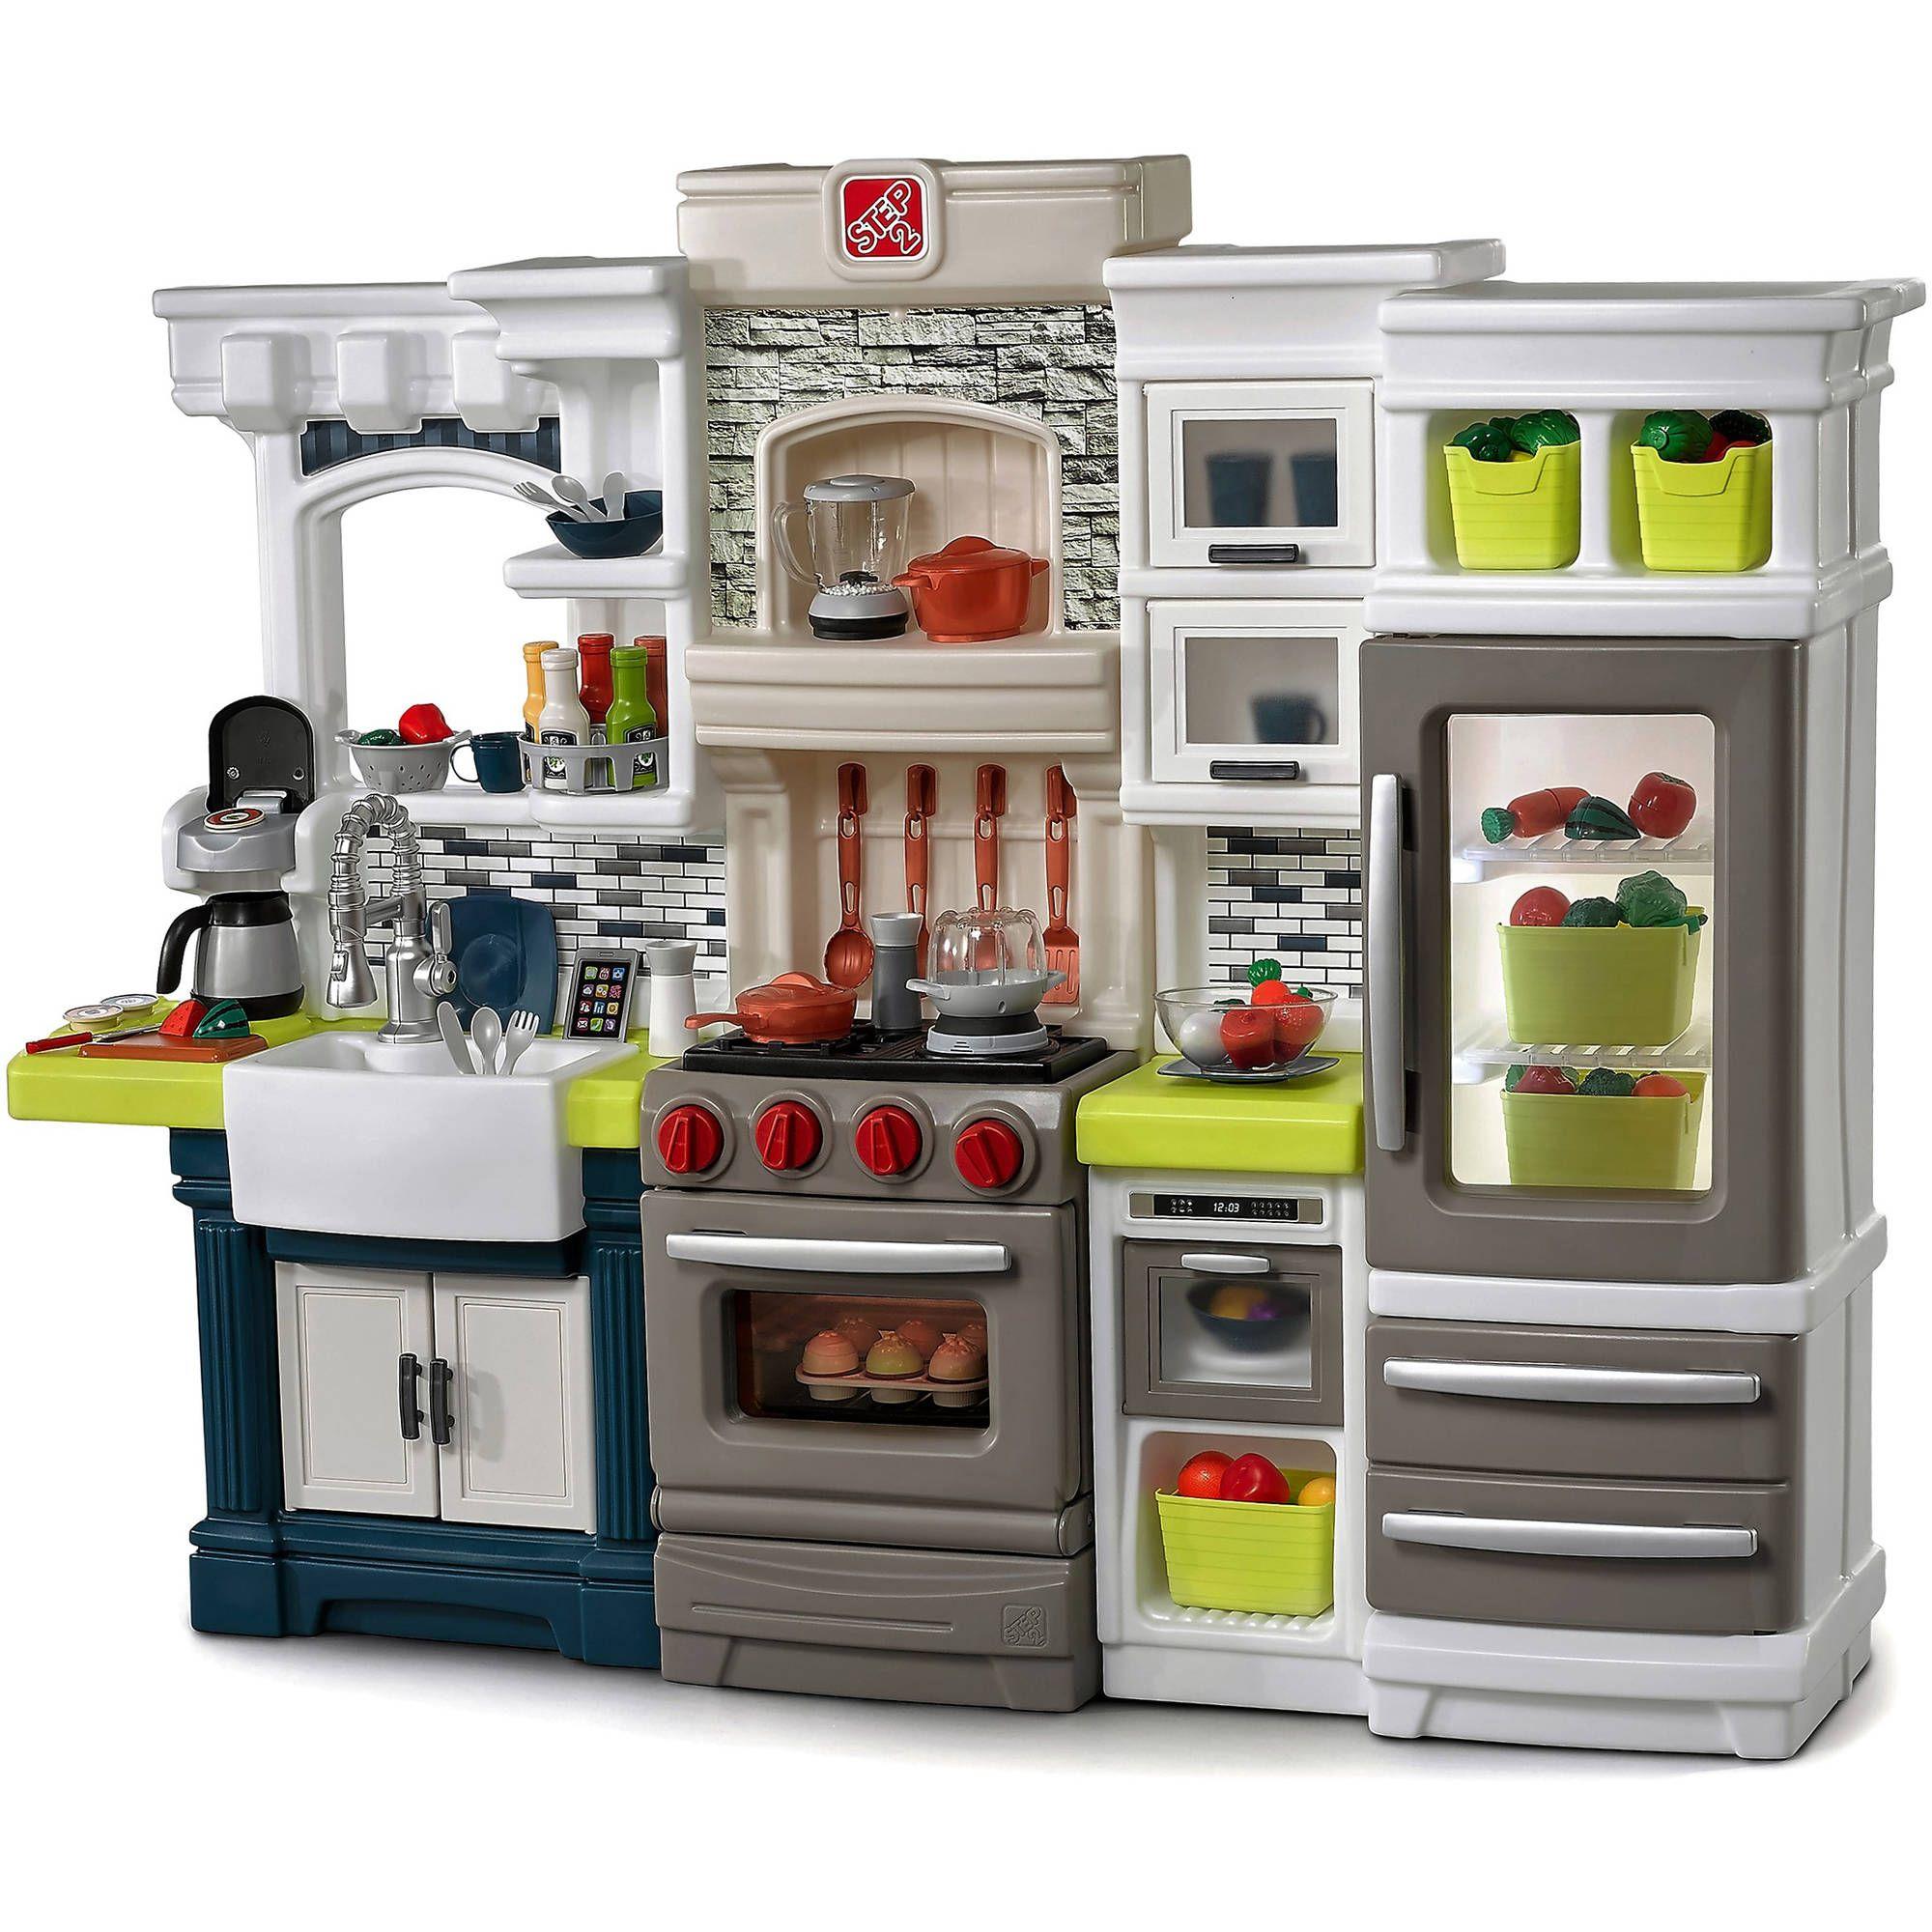 Step12 Elegant Edge Kitchen Large Kitchen Play Set - Walmart.com